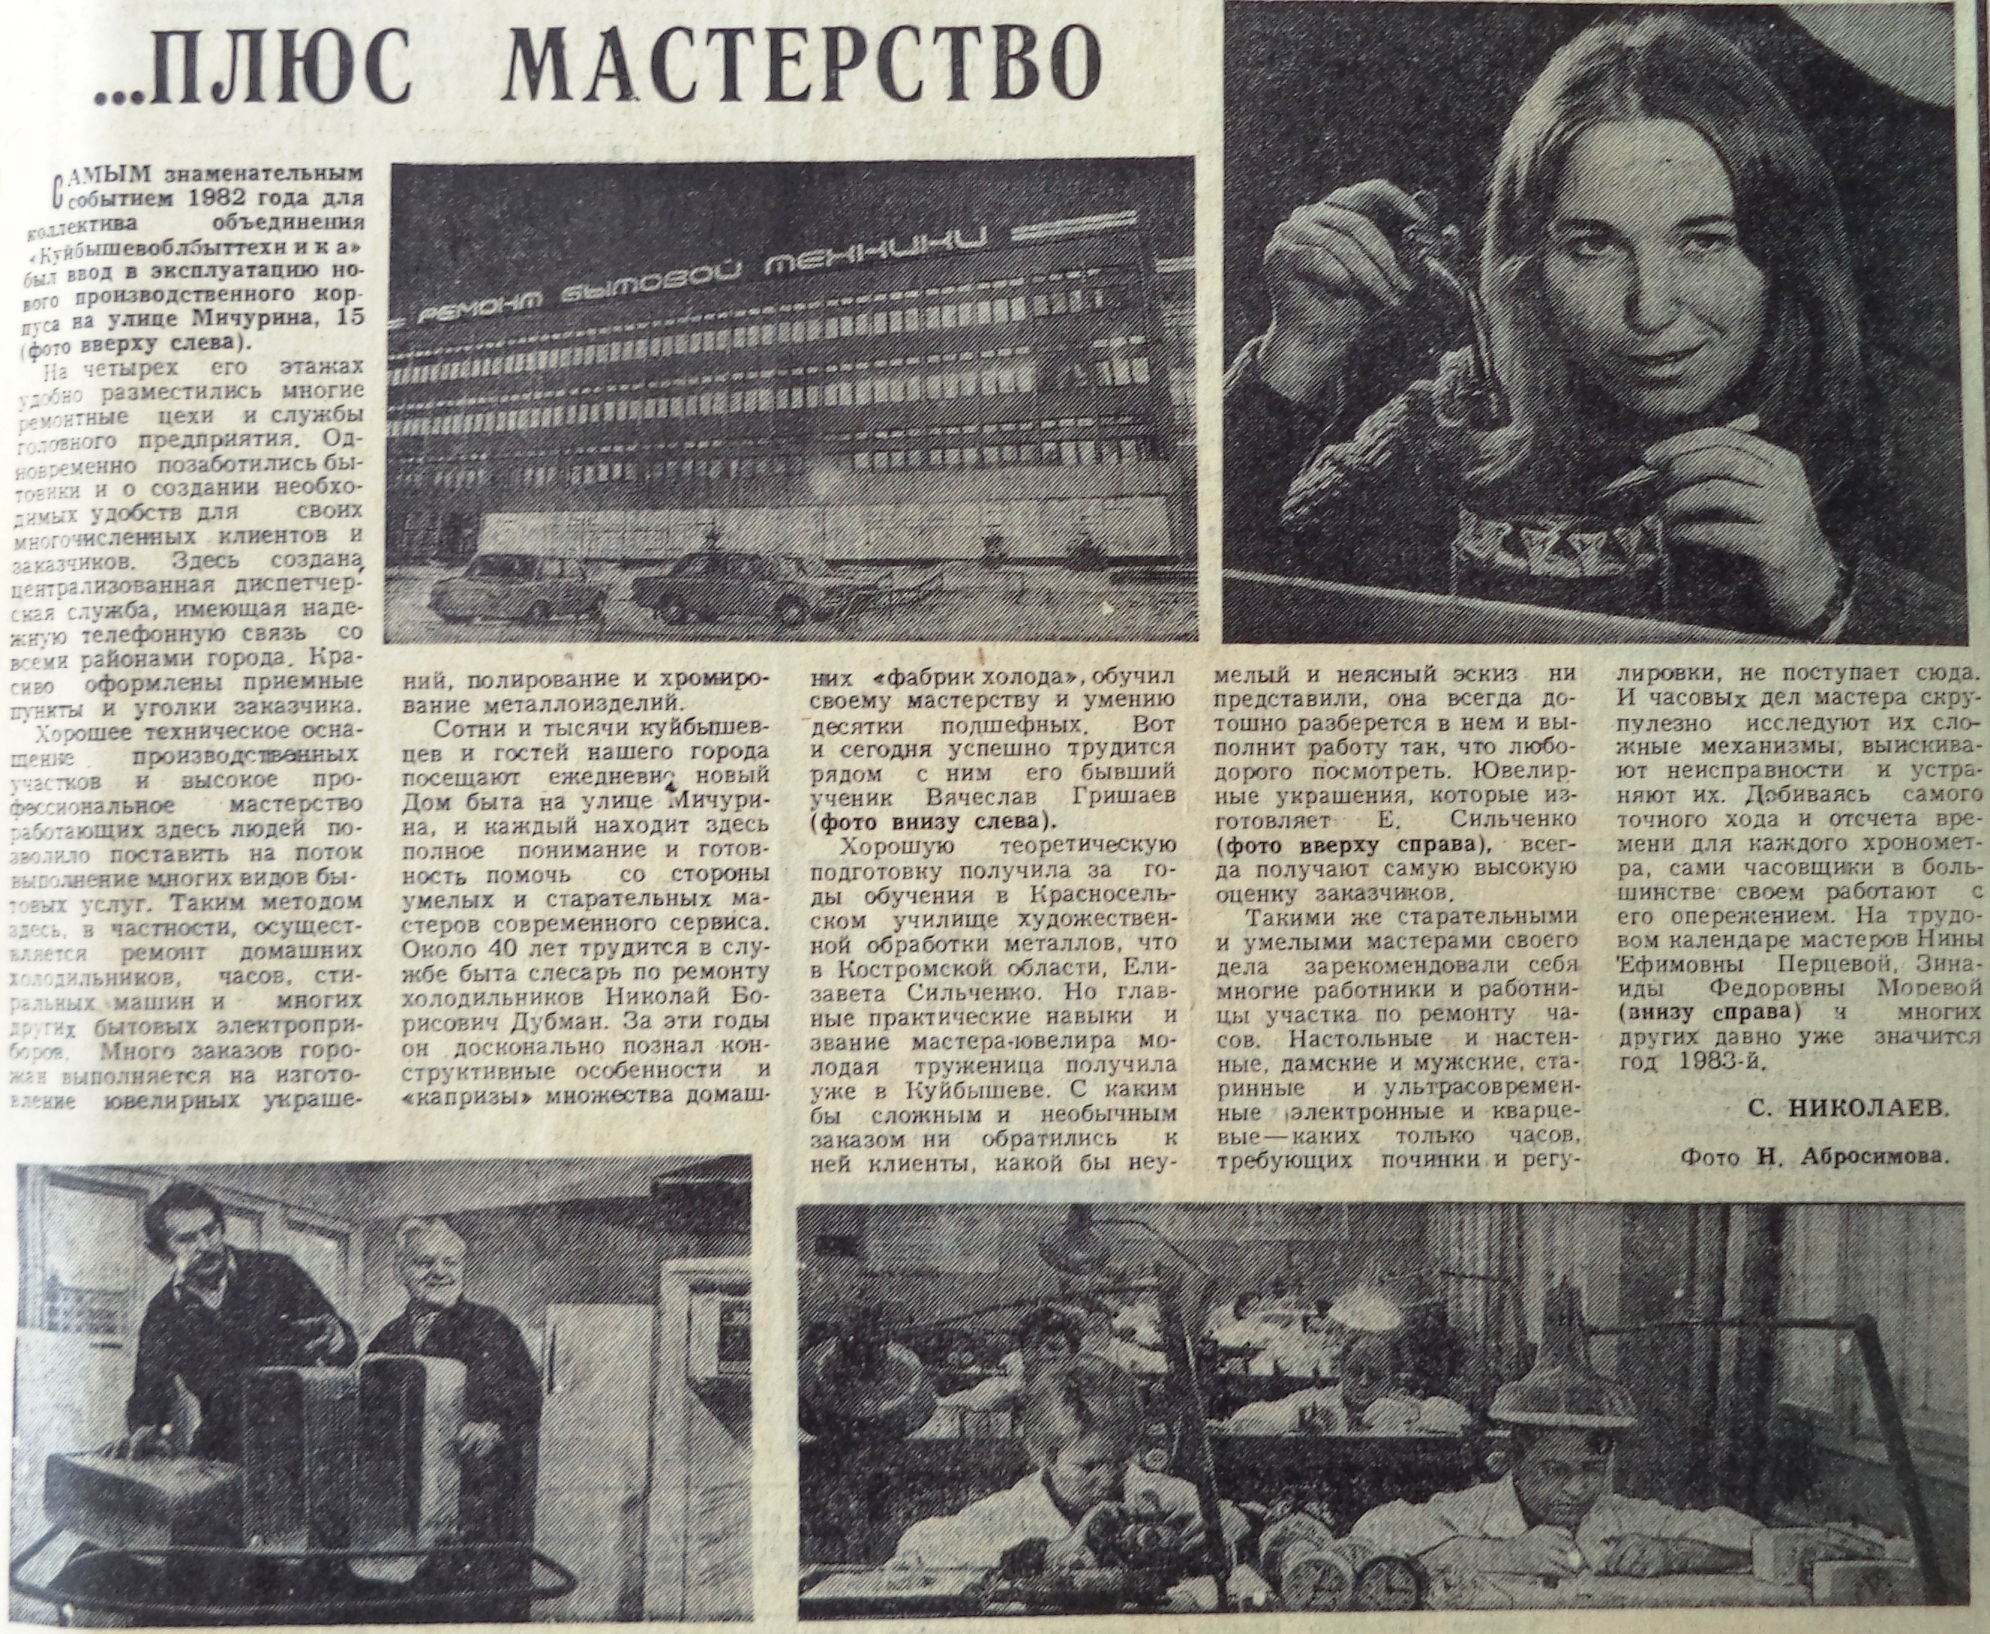 Akv_-FOTO-08-VZya-1982-12-31-reportazh_iz_Akvariuma